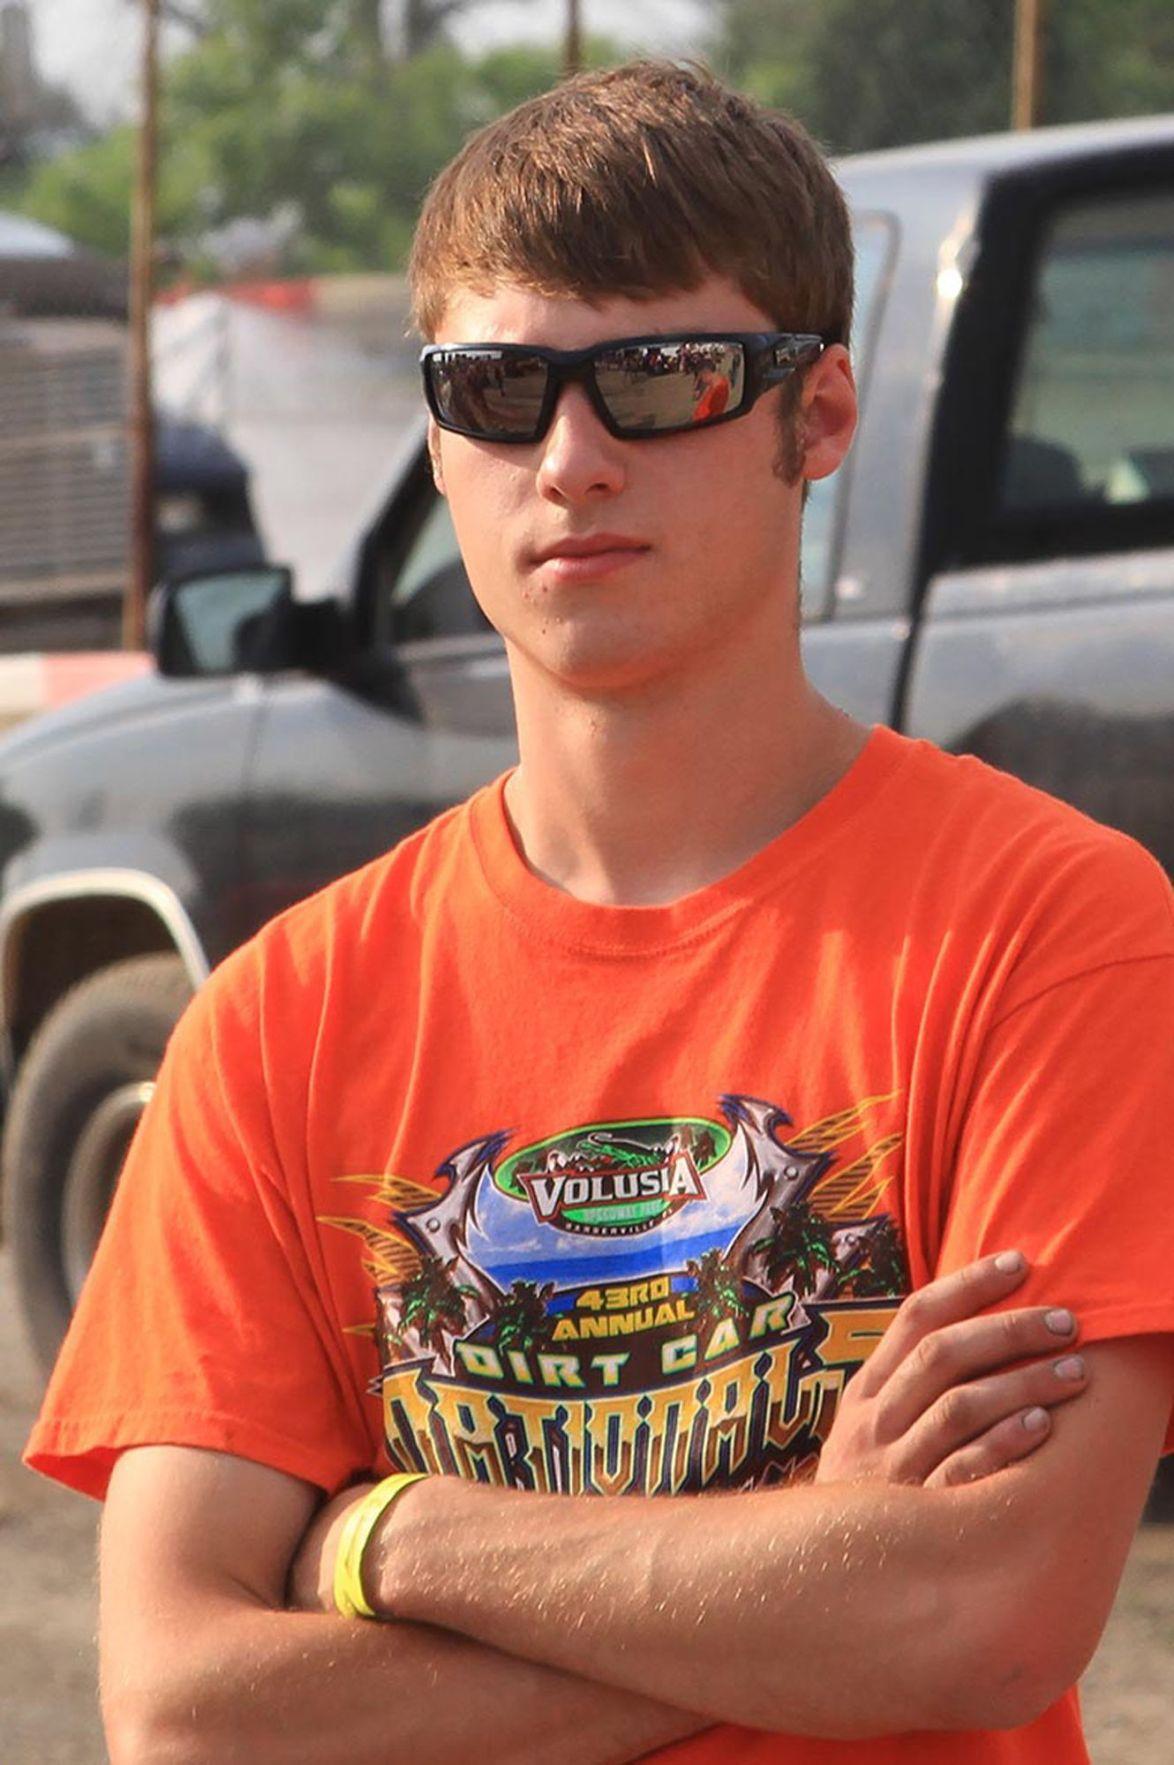 Stewart misses race as probe begins in driver's death